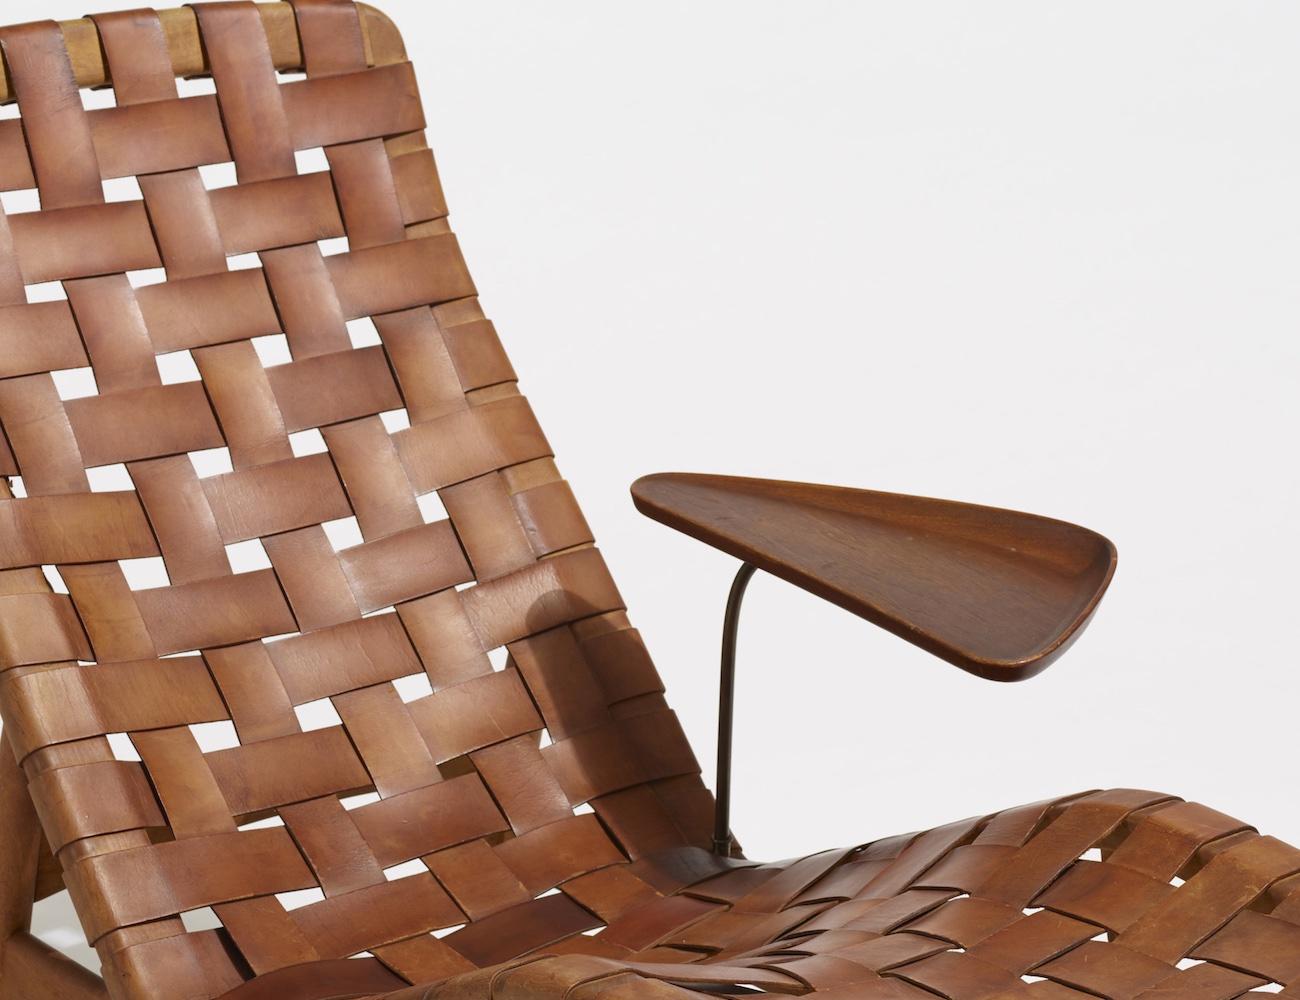 Arne Vodder Sculptural Chaise Lounge Chair